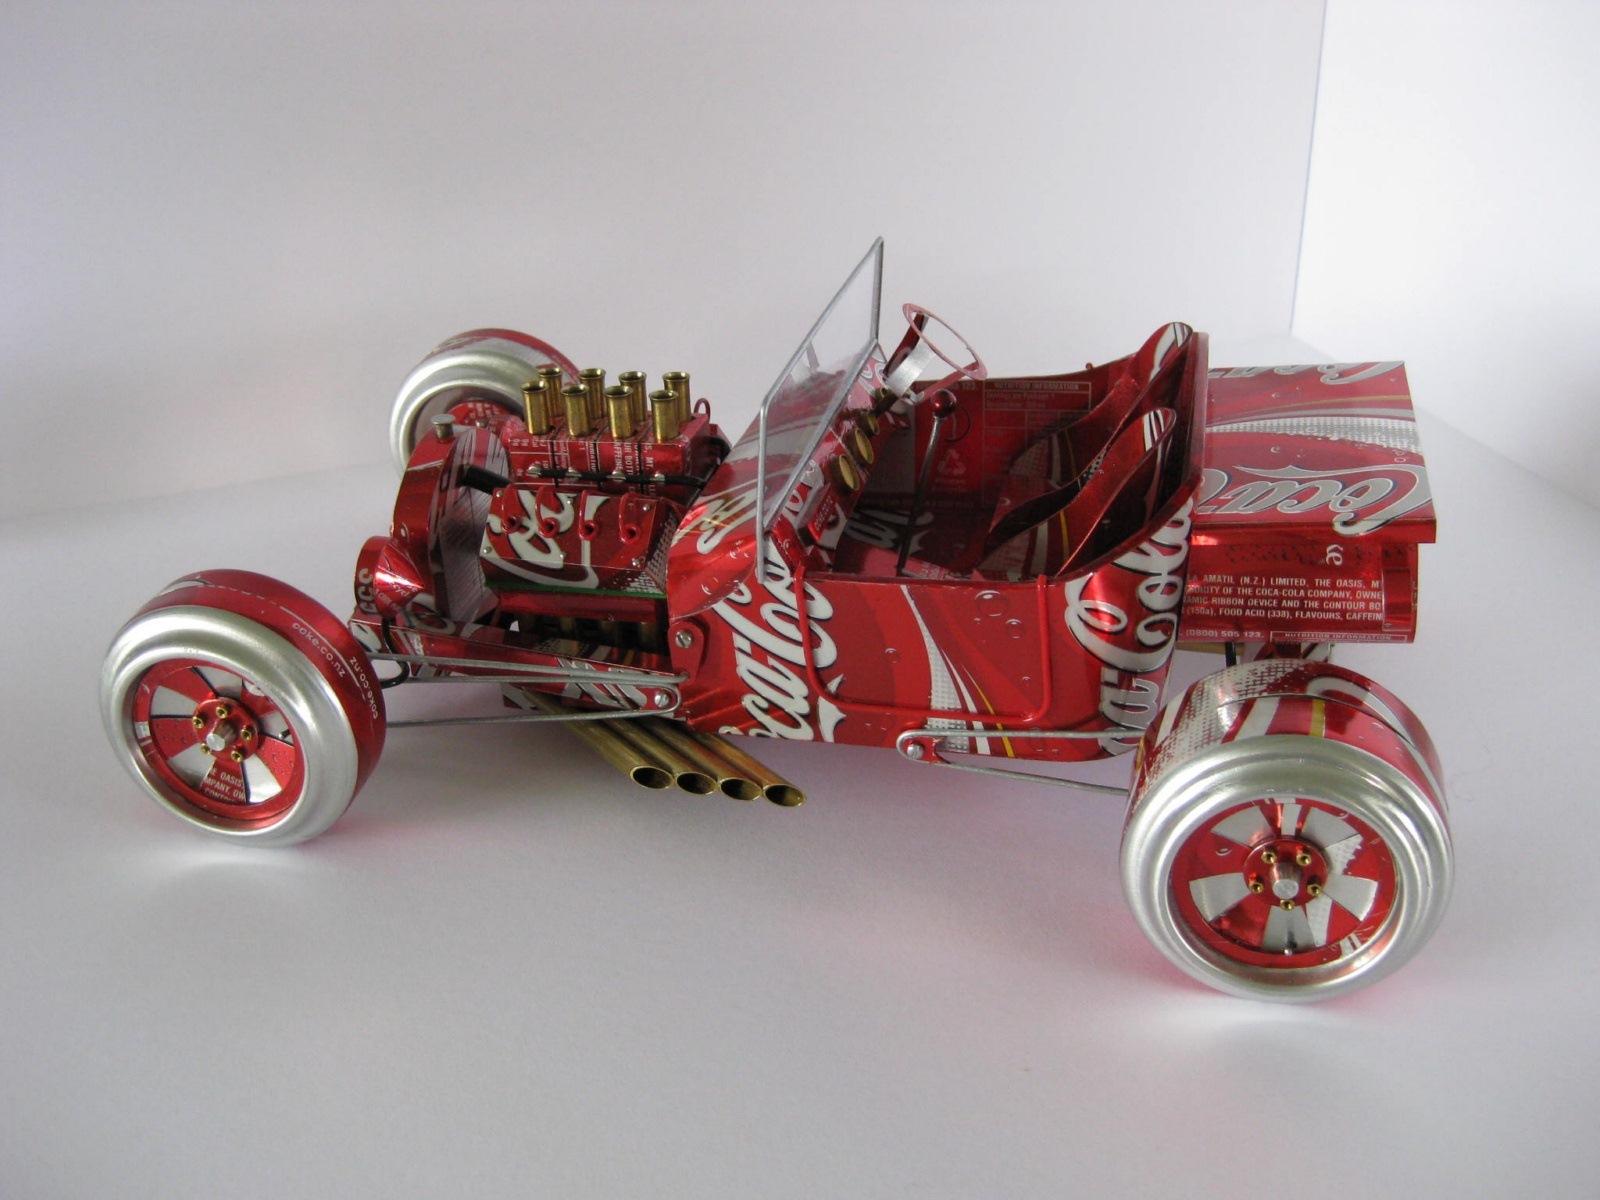 Miniature Cars From Aluminum